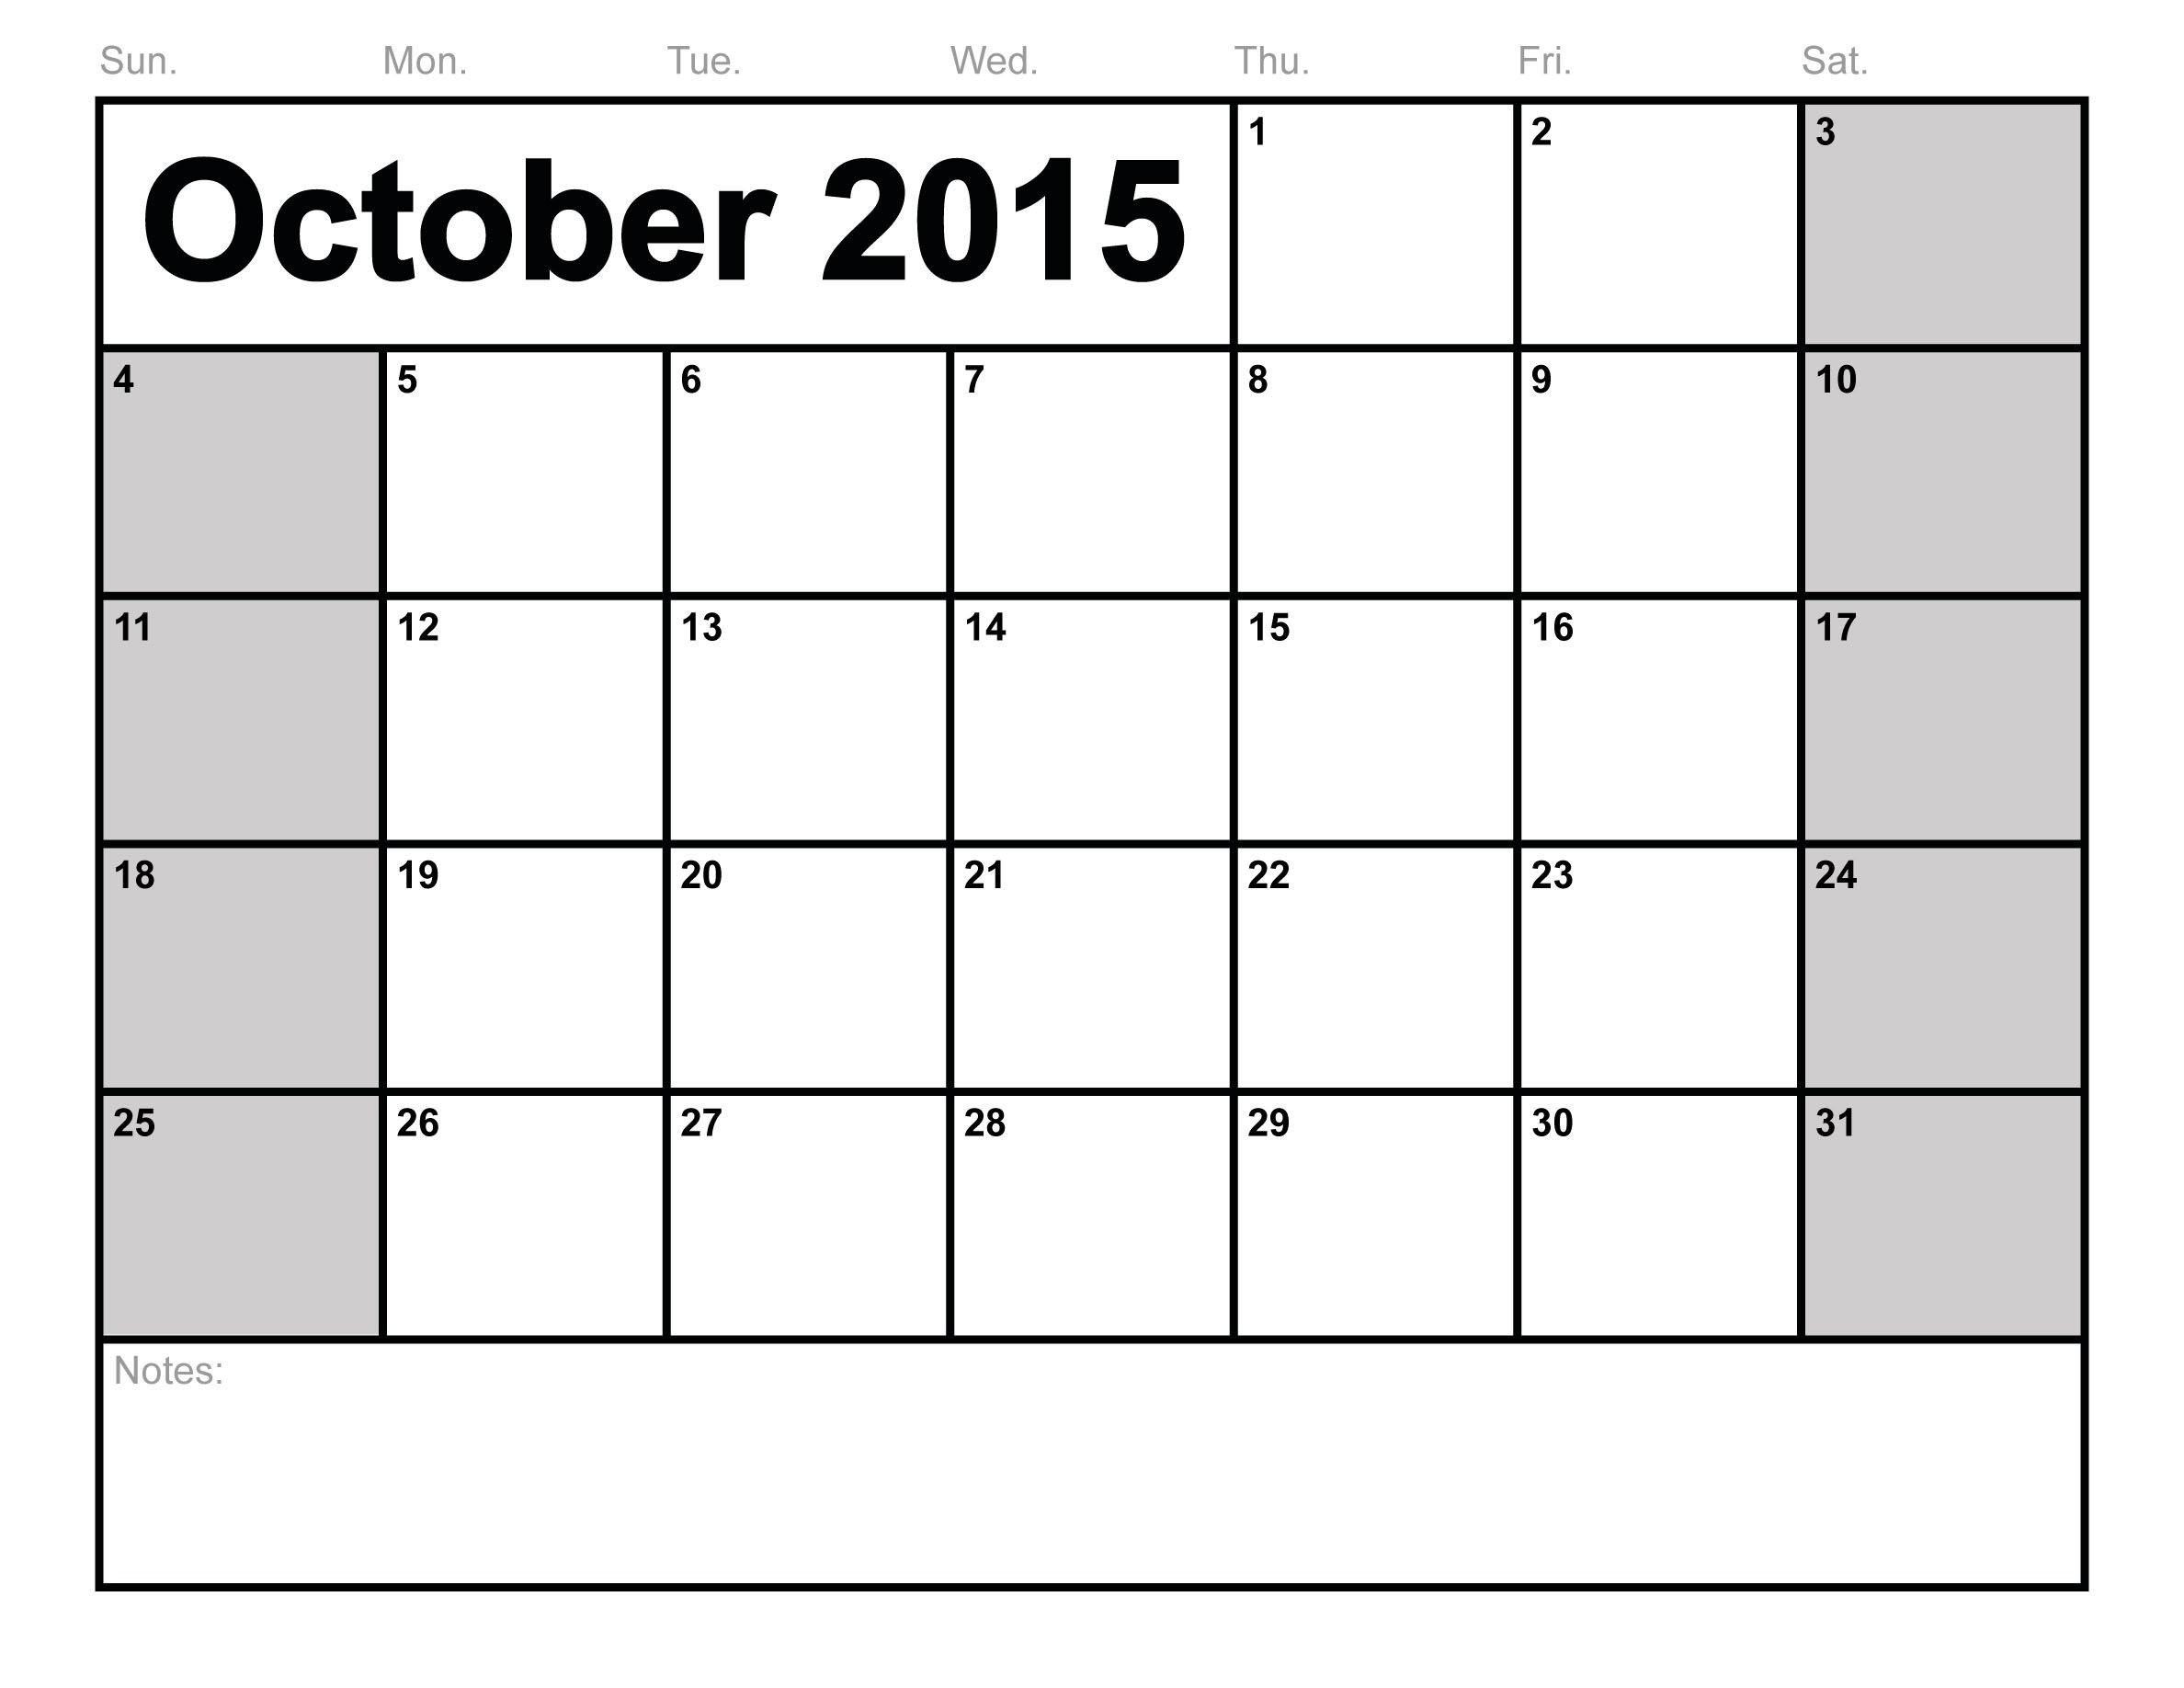 Word-Blank-Printable Calendar Templates pertaining to Full Size Blank Printable Calendar